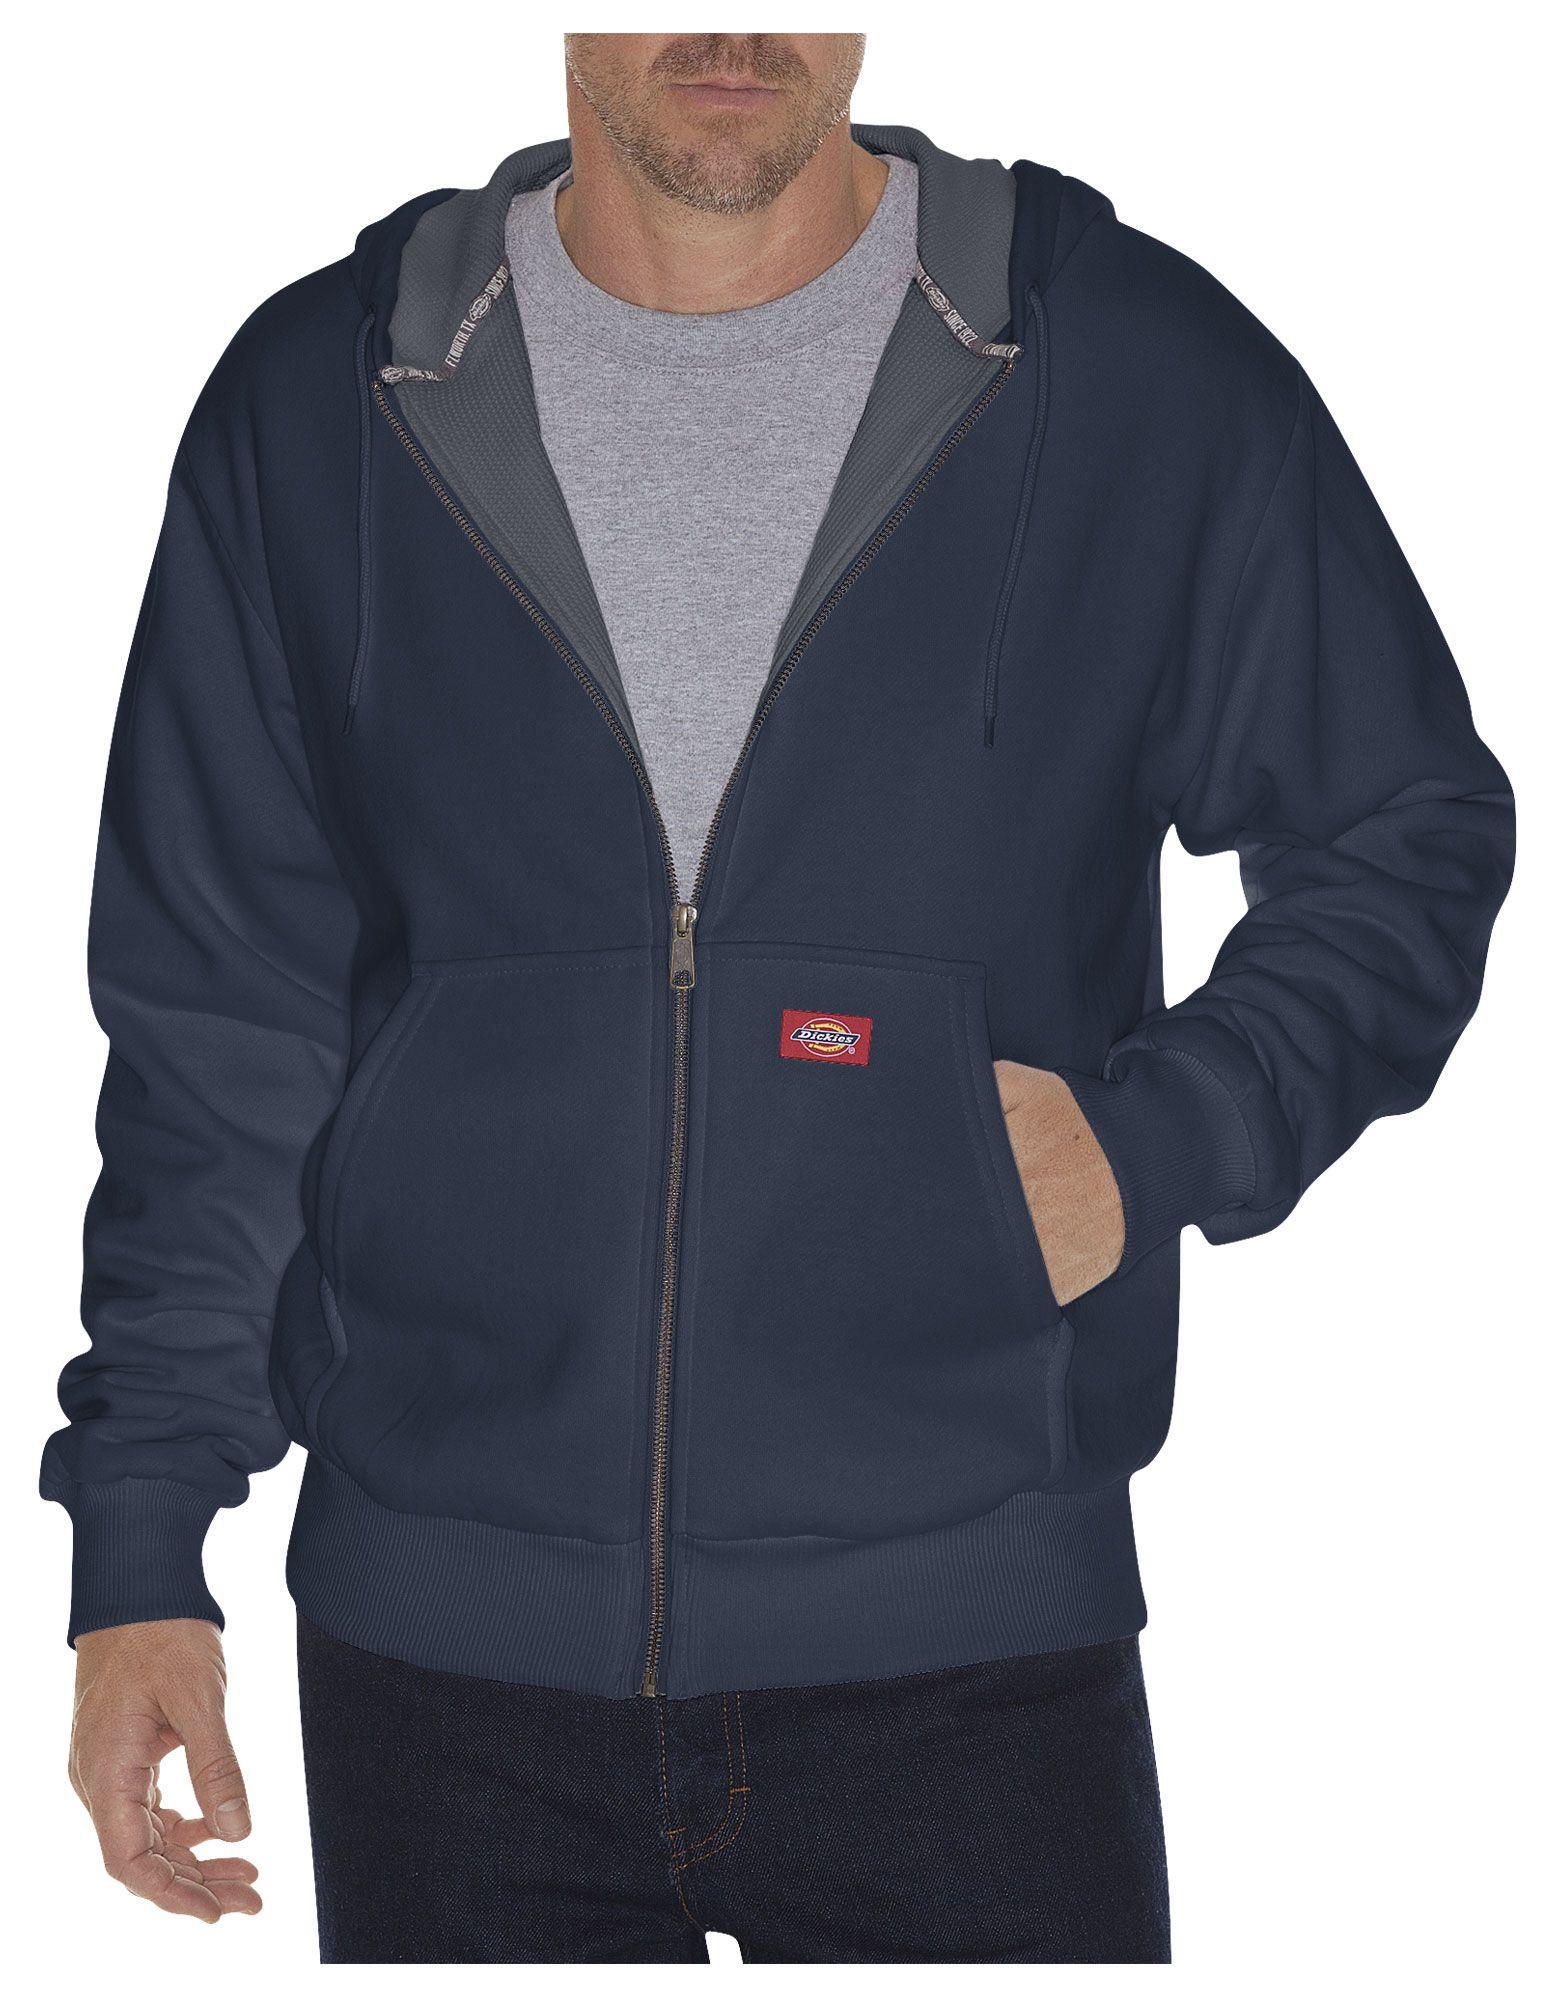 Thermal Lined Hoodies For Men Black Dickies Work Jackets Fleece Hoodie Fleece Jacket [ 2000 x 1563 Pixel ]